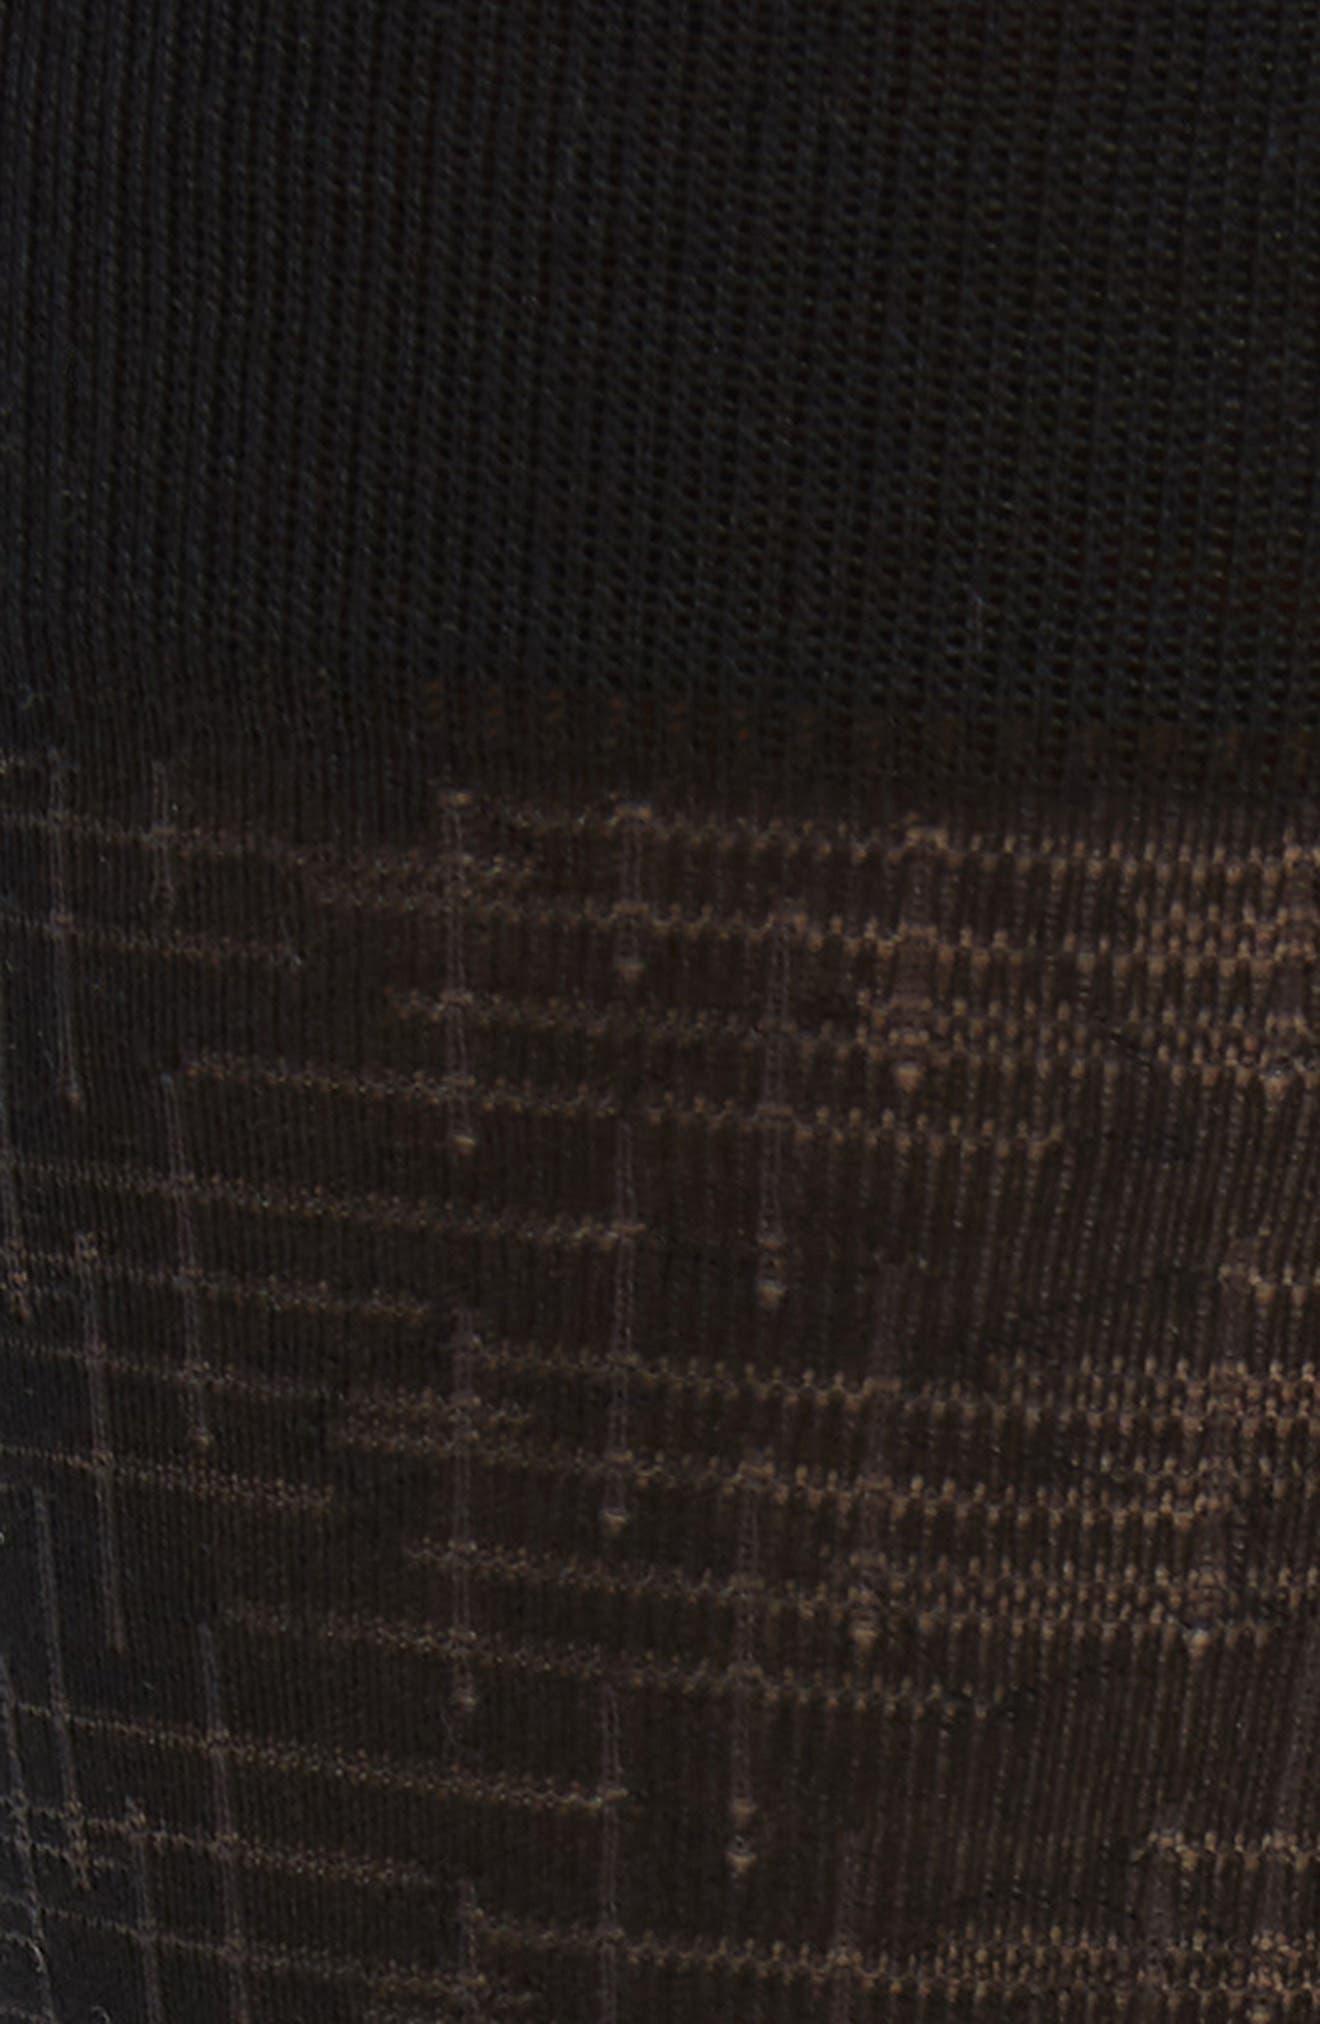 Crosshatch Socks,                             Alternate thumbnail 2, color,                             Black/ Charcoal